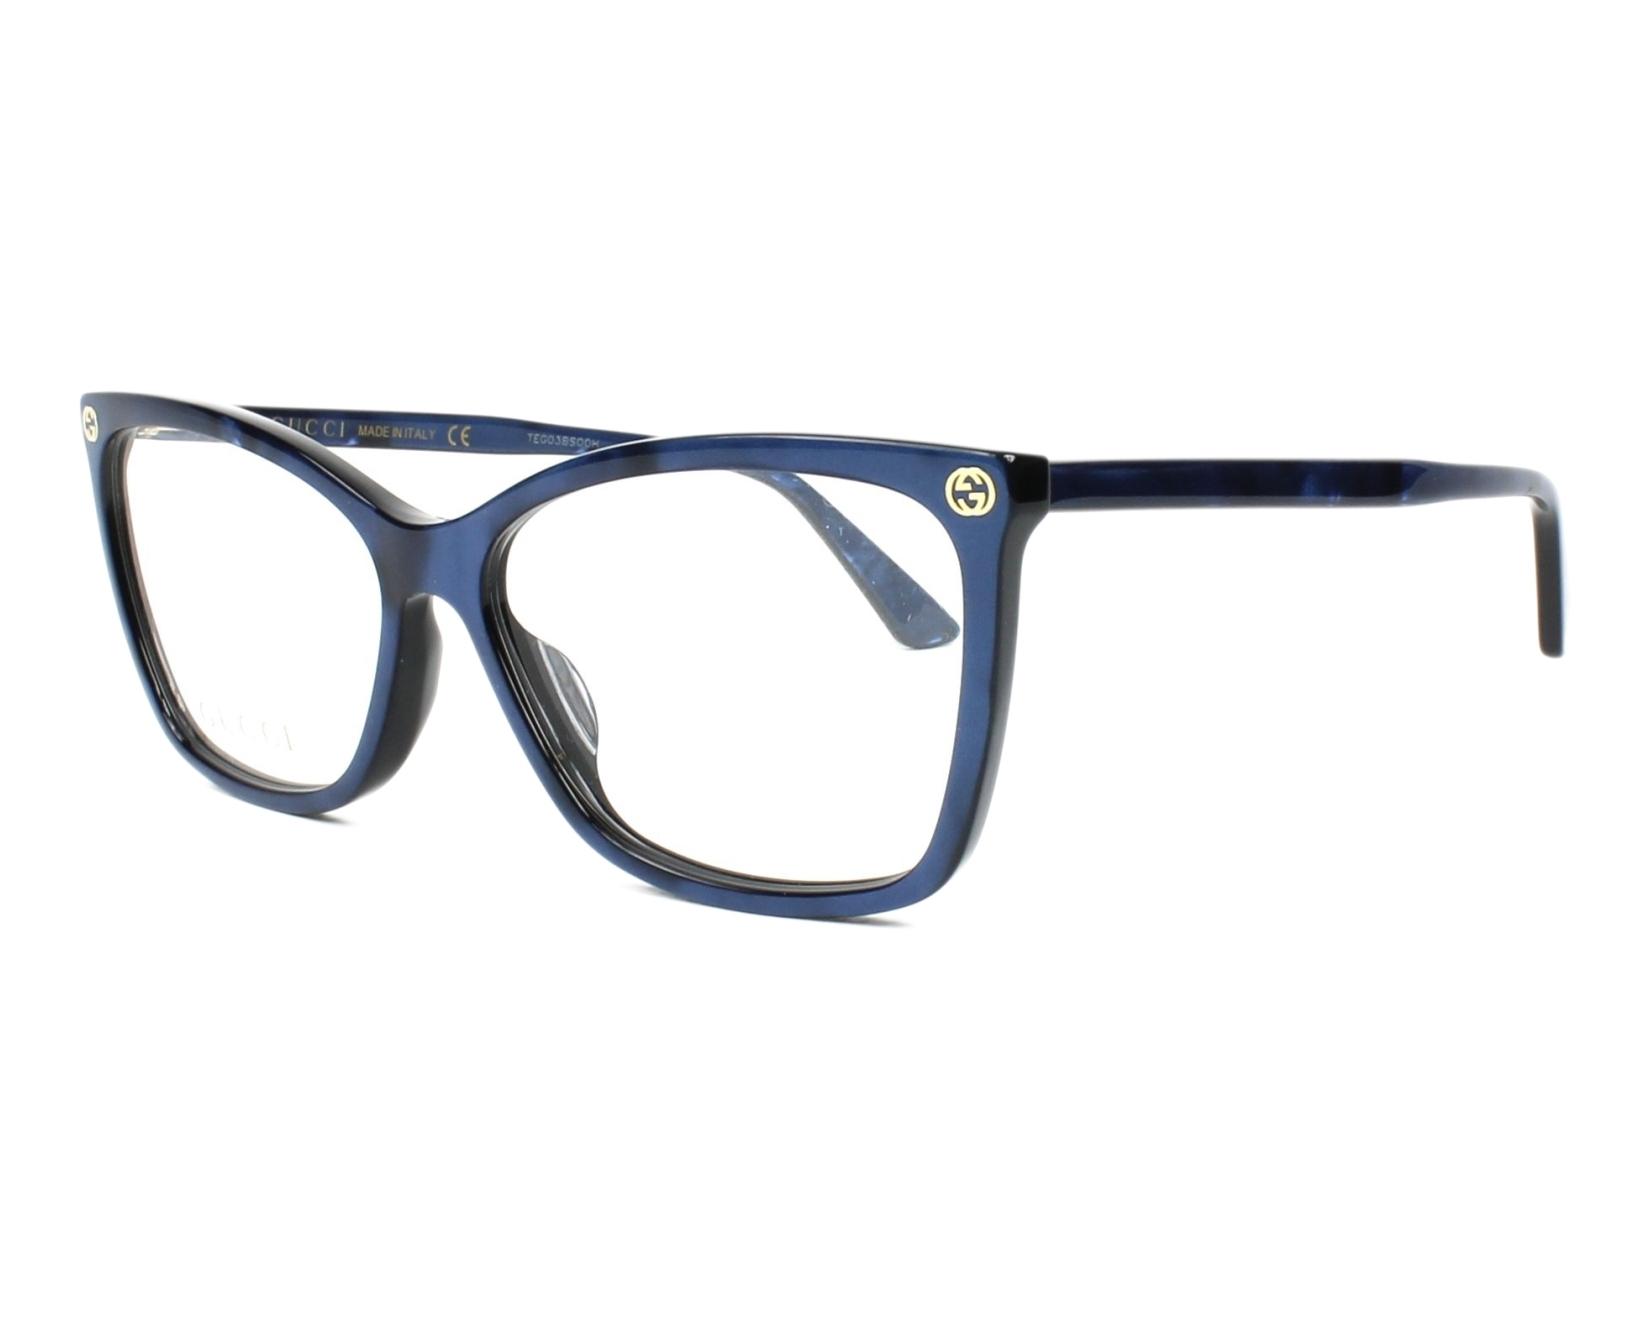 178b4abbcc7 eyeglasses Gucci GG-00250 005 56-14 Blue profile view